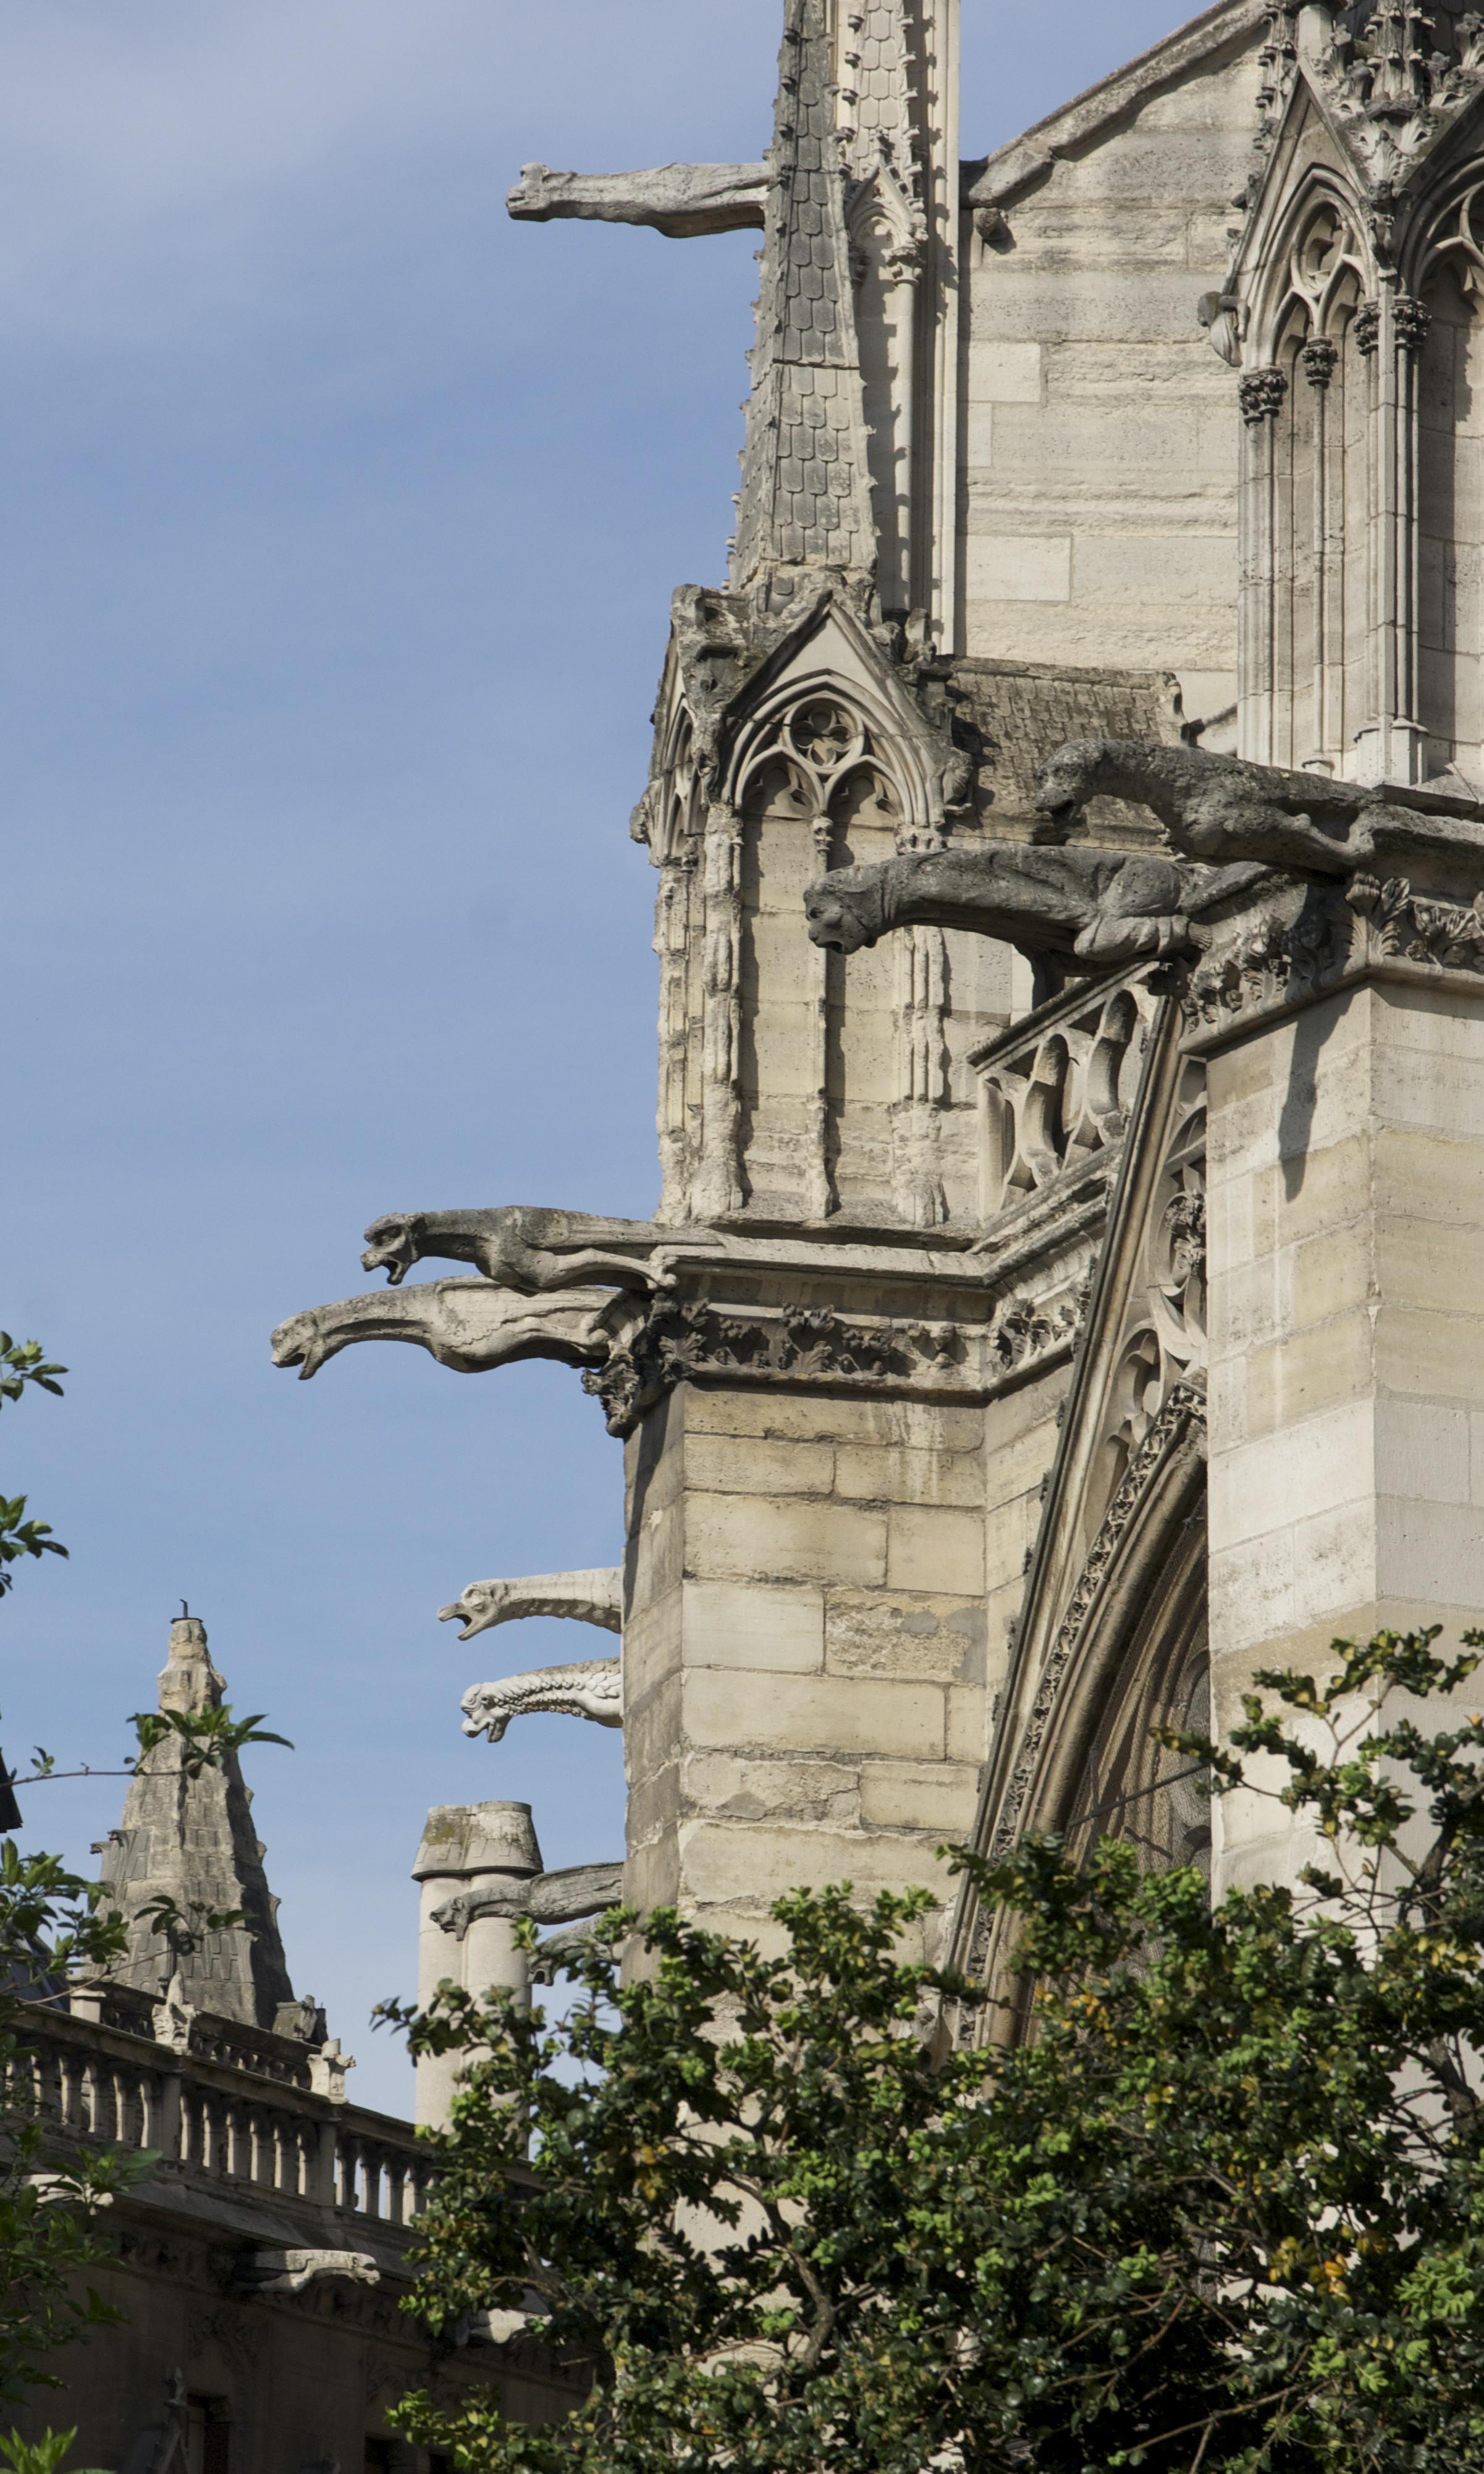 Gargouilles Notre Dame De Paris : gargouilles, notre, paris, File:Gargouilles, Gargoyles, Notre, Paris.jpg, Wikimedia, Commons